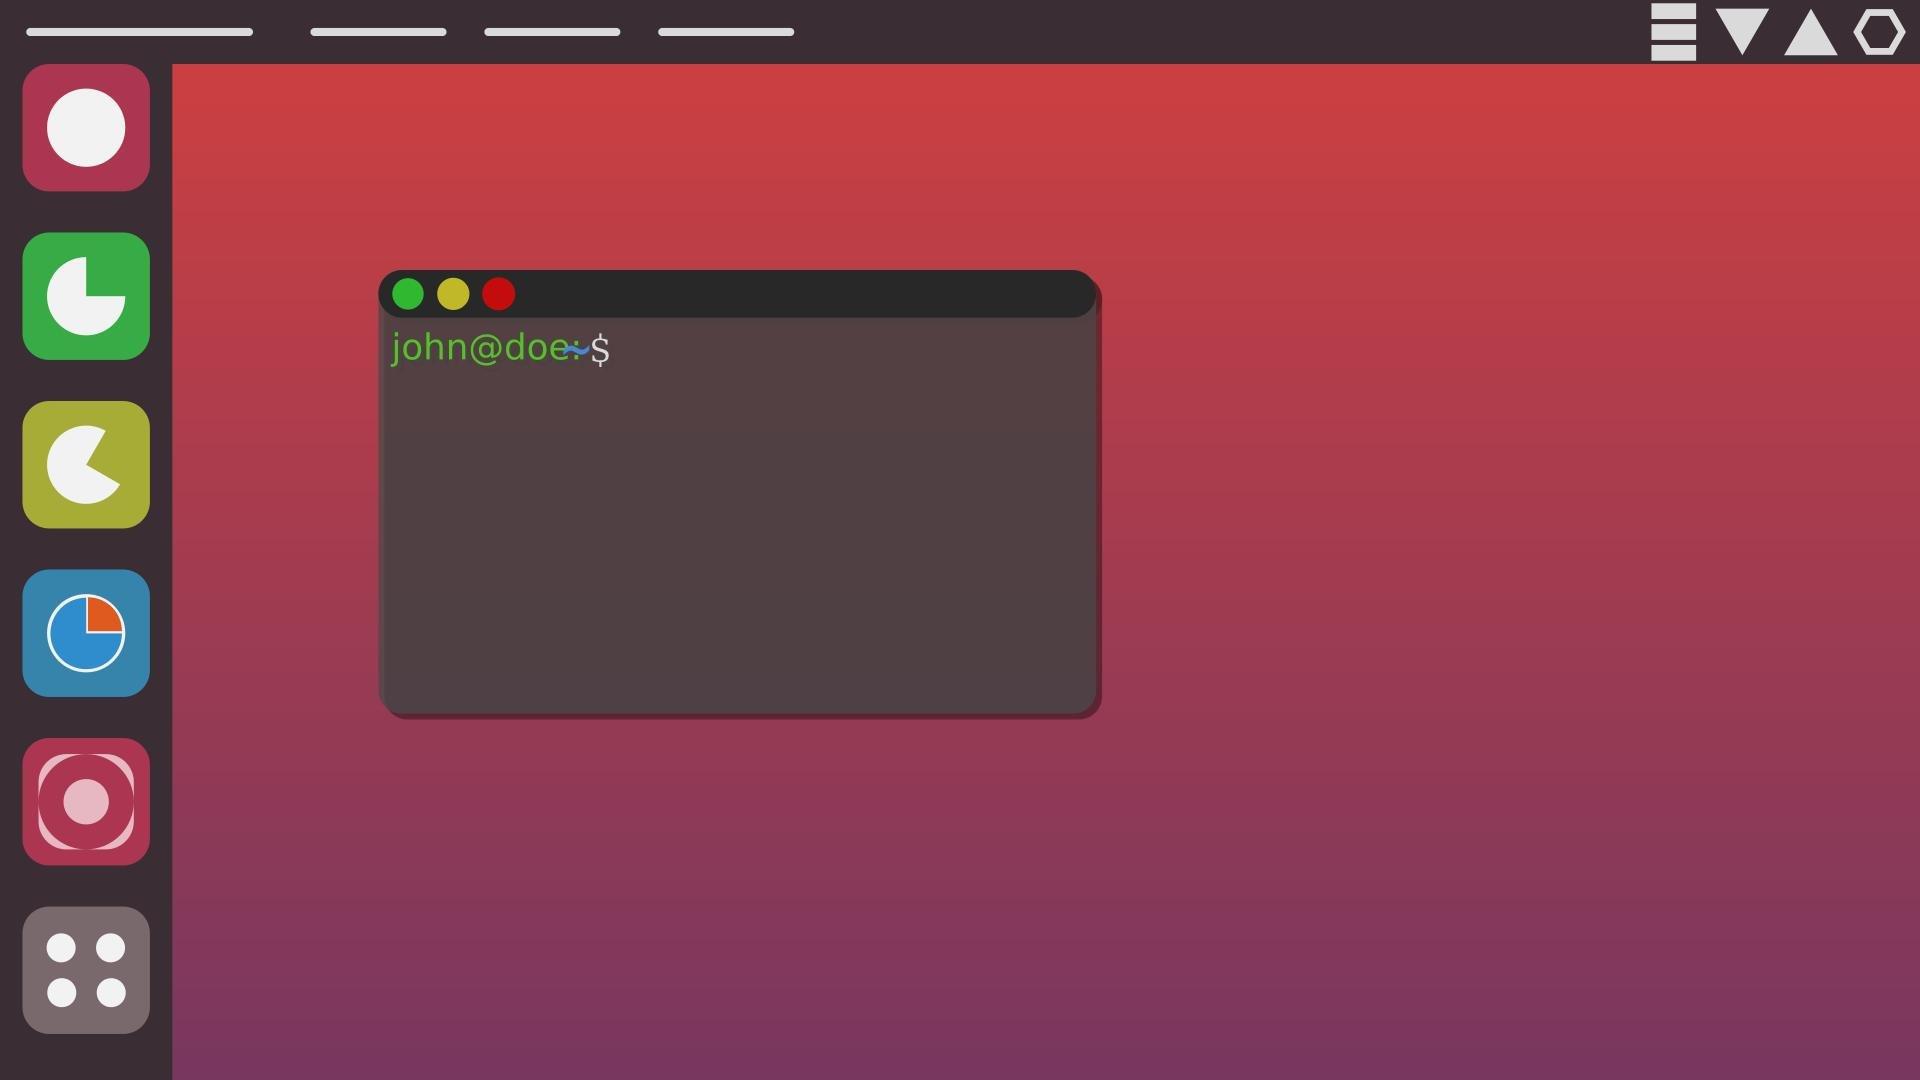 Основы терминала Linux, шпаргалка для новичков